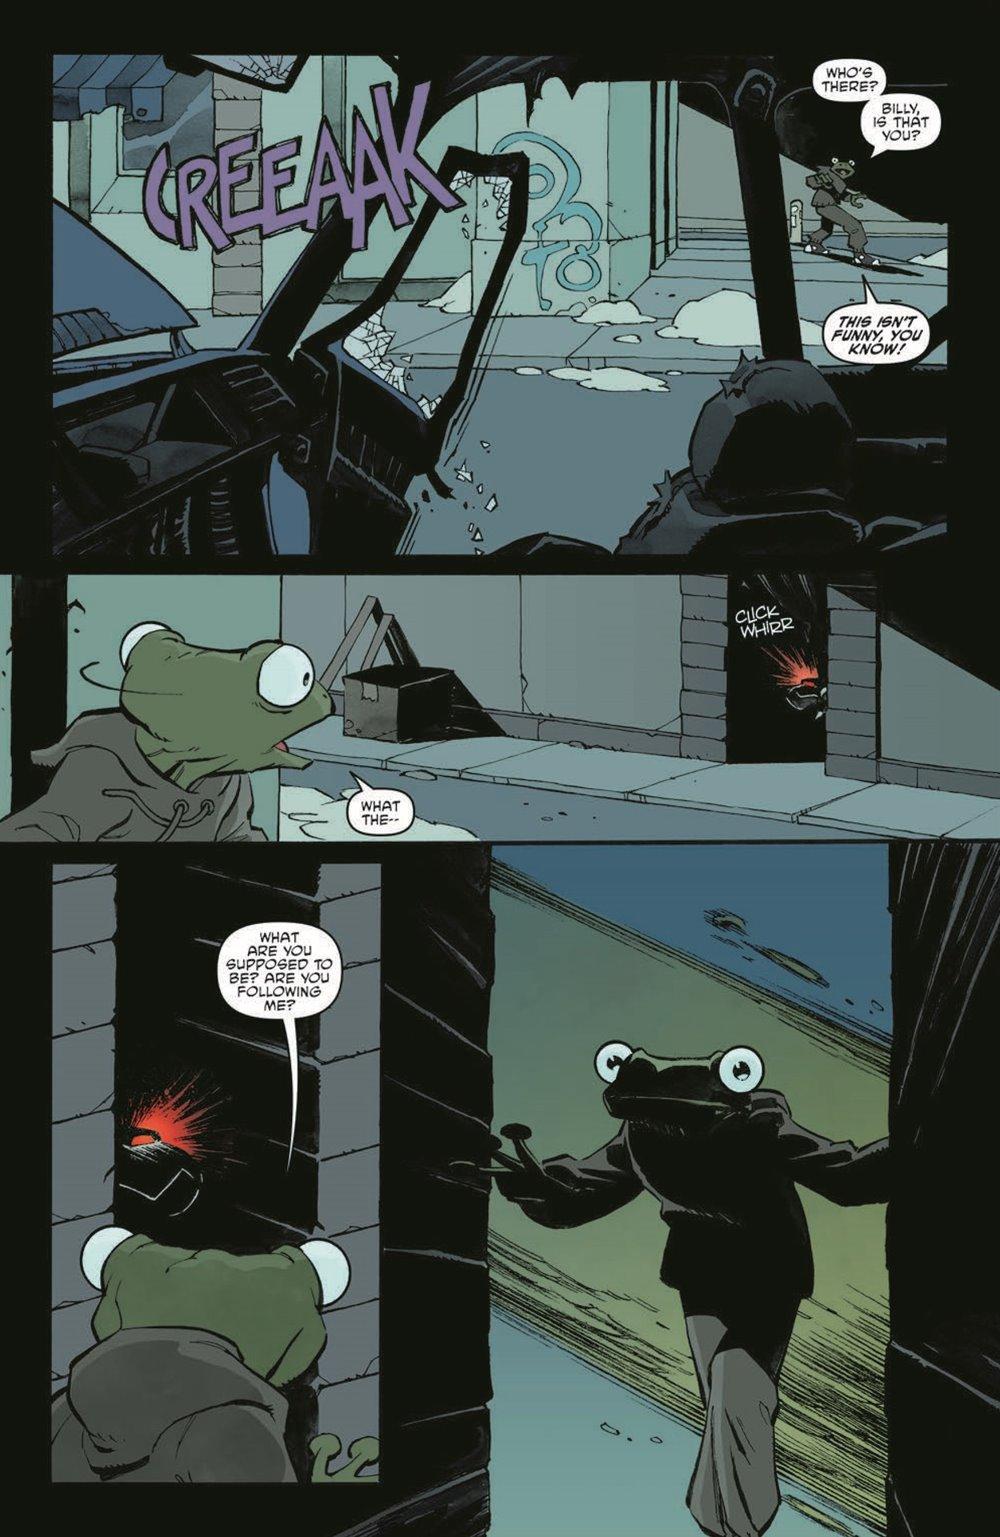 TMNT-Reborn02_pr-5 ComicList Previews: TEENAGE MUTANT NINJA TURTLES REBORN VOLUME 2 LIFE AFTER DEATH TP